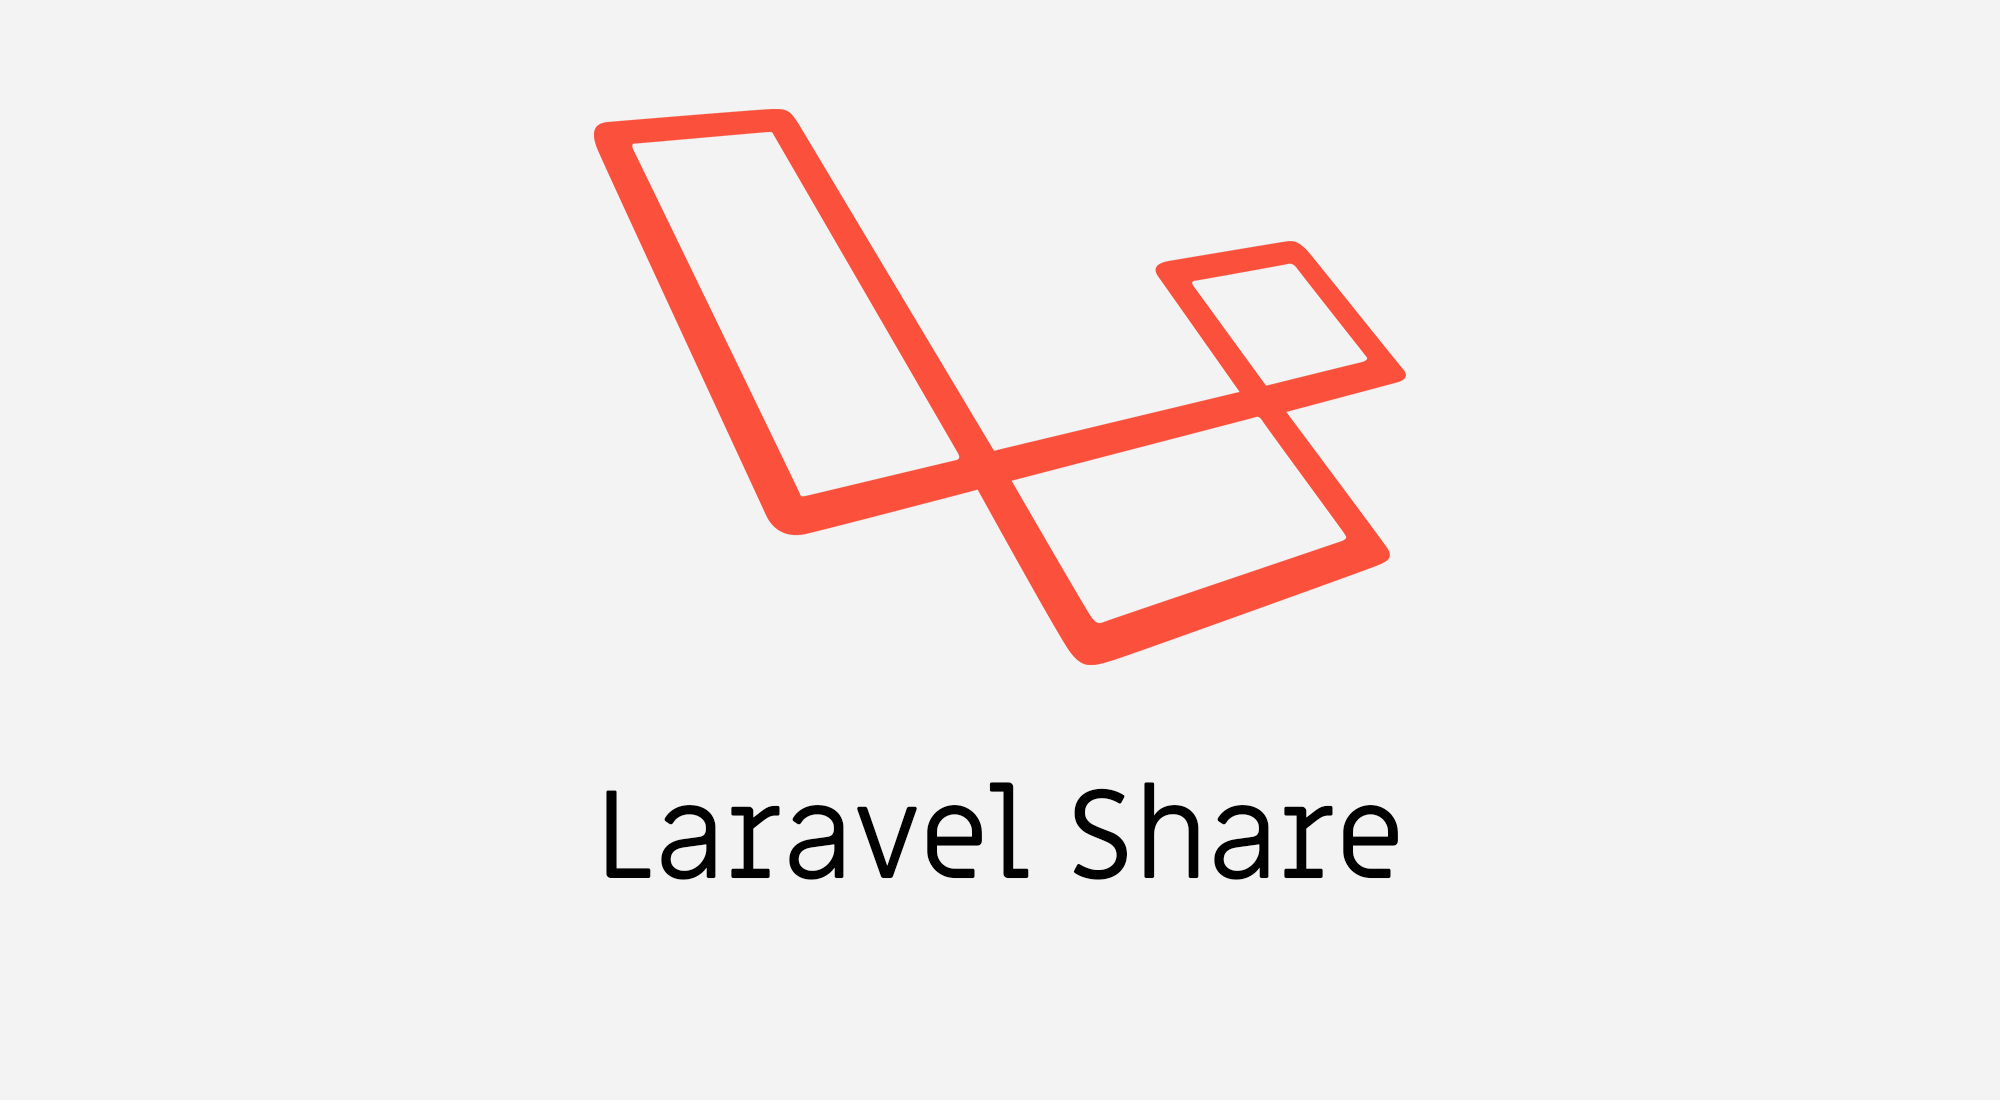 Laravel share